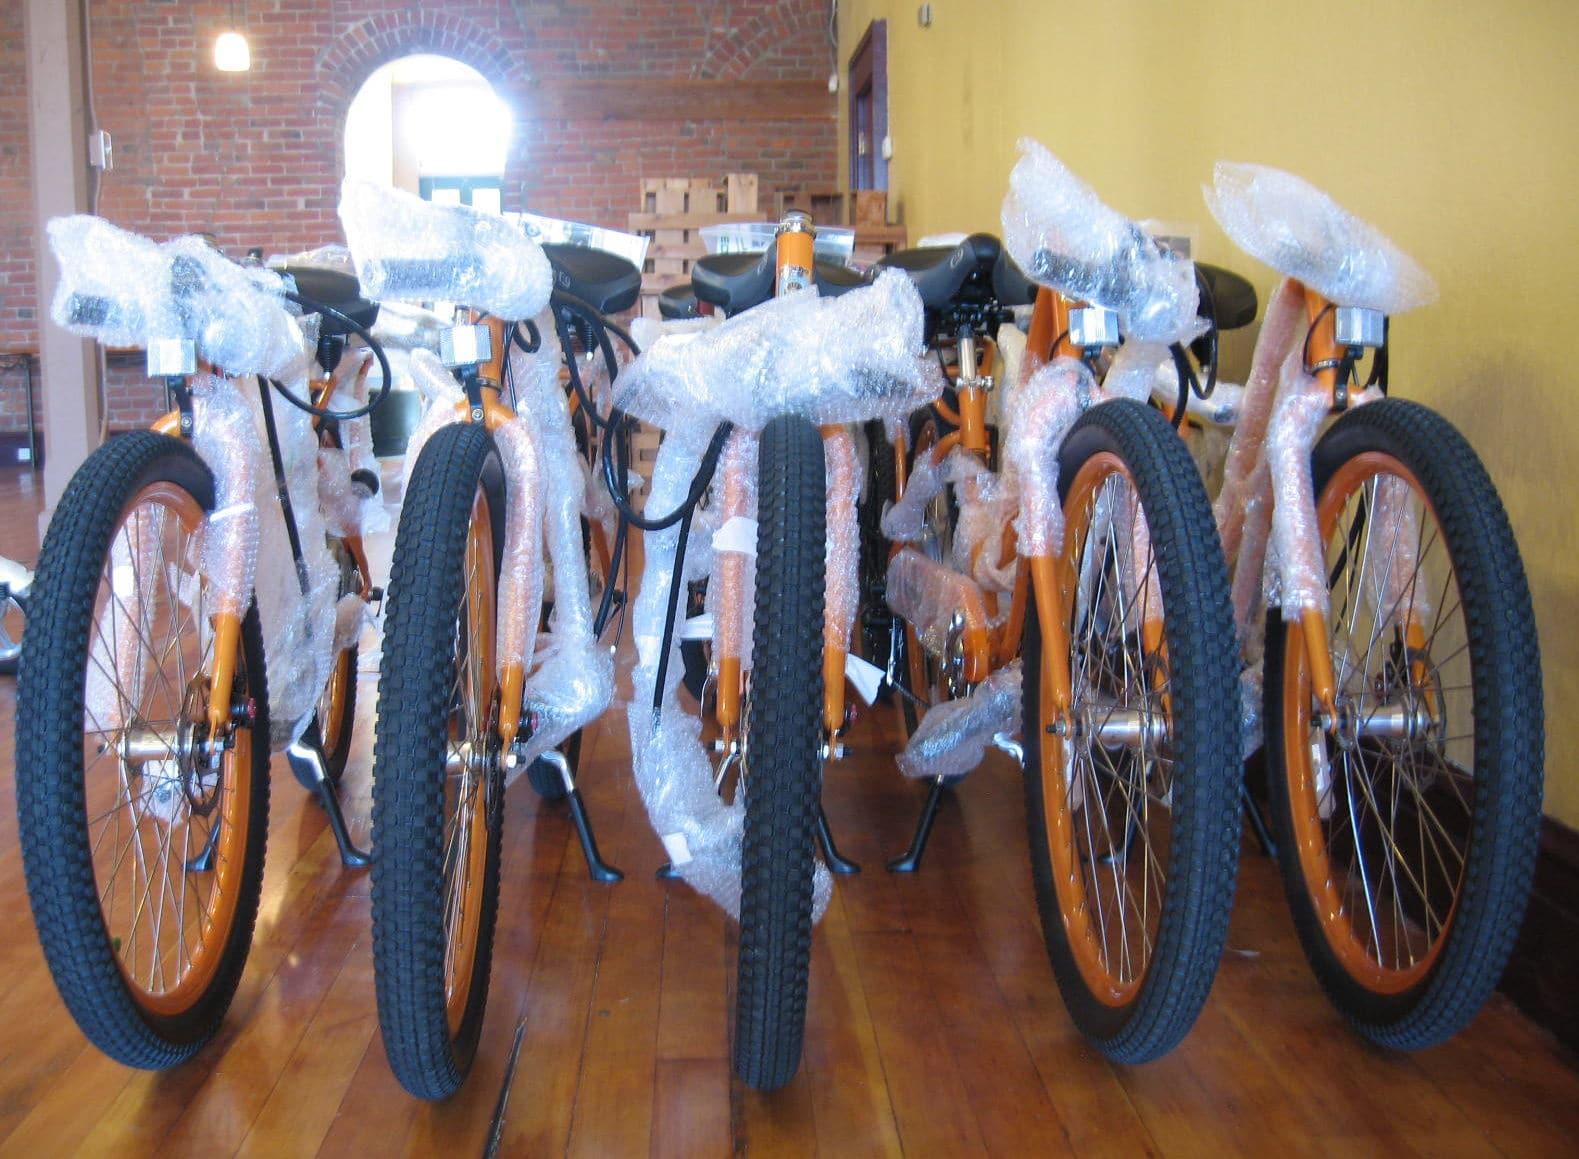 Bikes Stores Sacramento Tim Castleman had a big